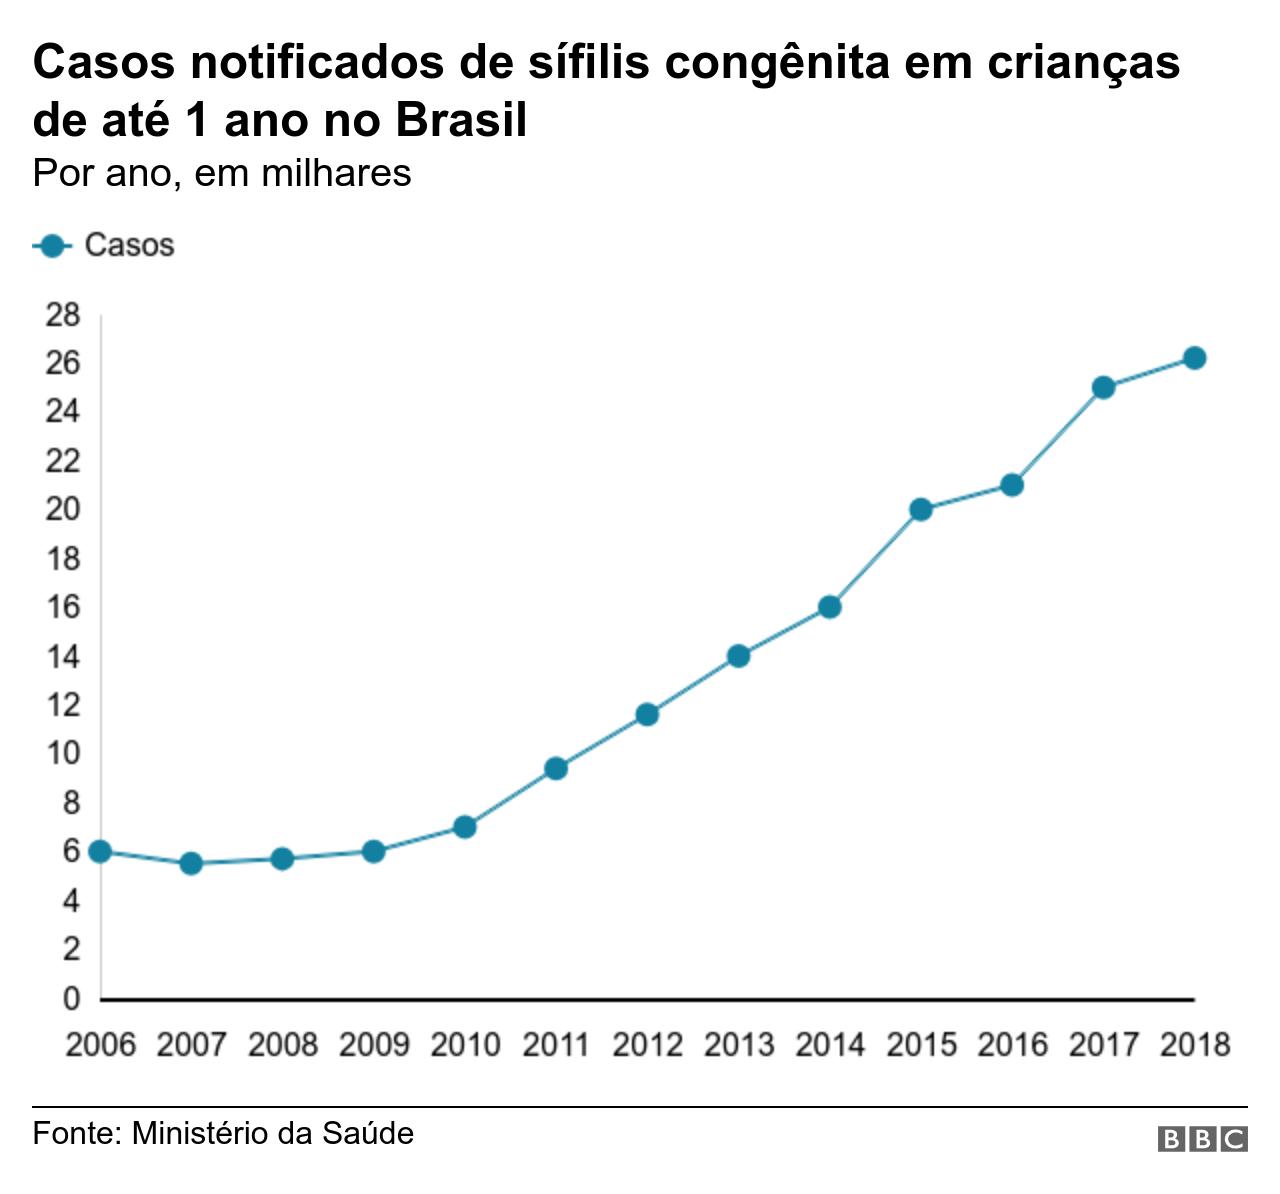 Gráfico casos notificados de sífilis congênita